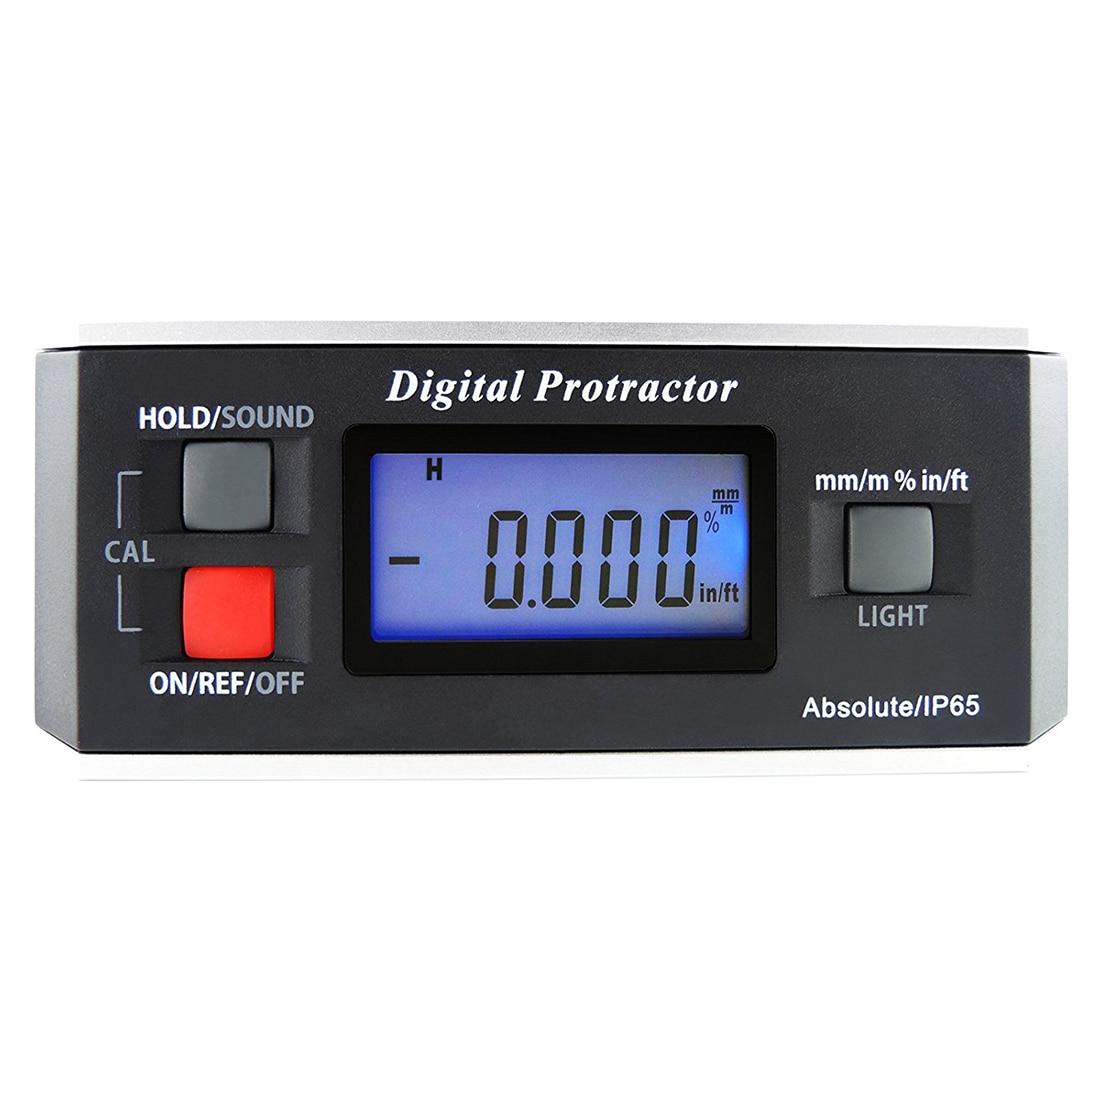 Mini Digital Inclinometer,360 degree Mini Digital Protractor Inclinometer Angle Meter with Base